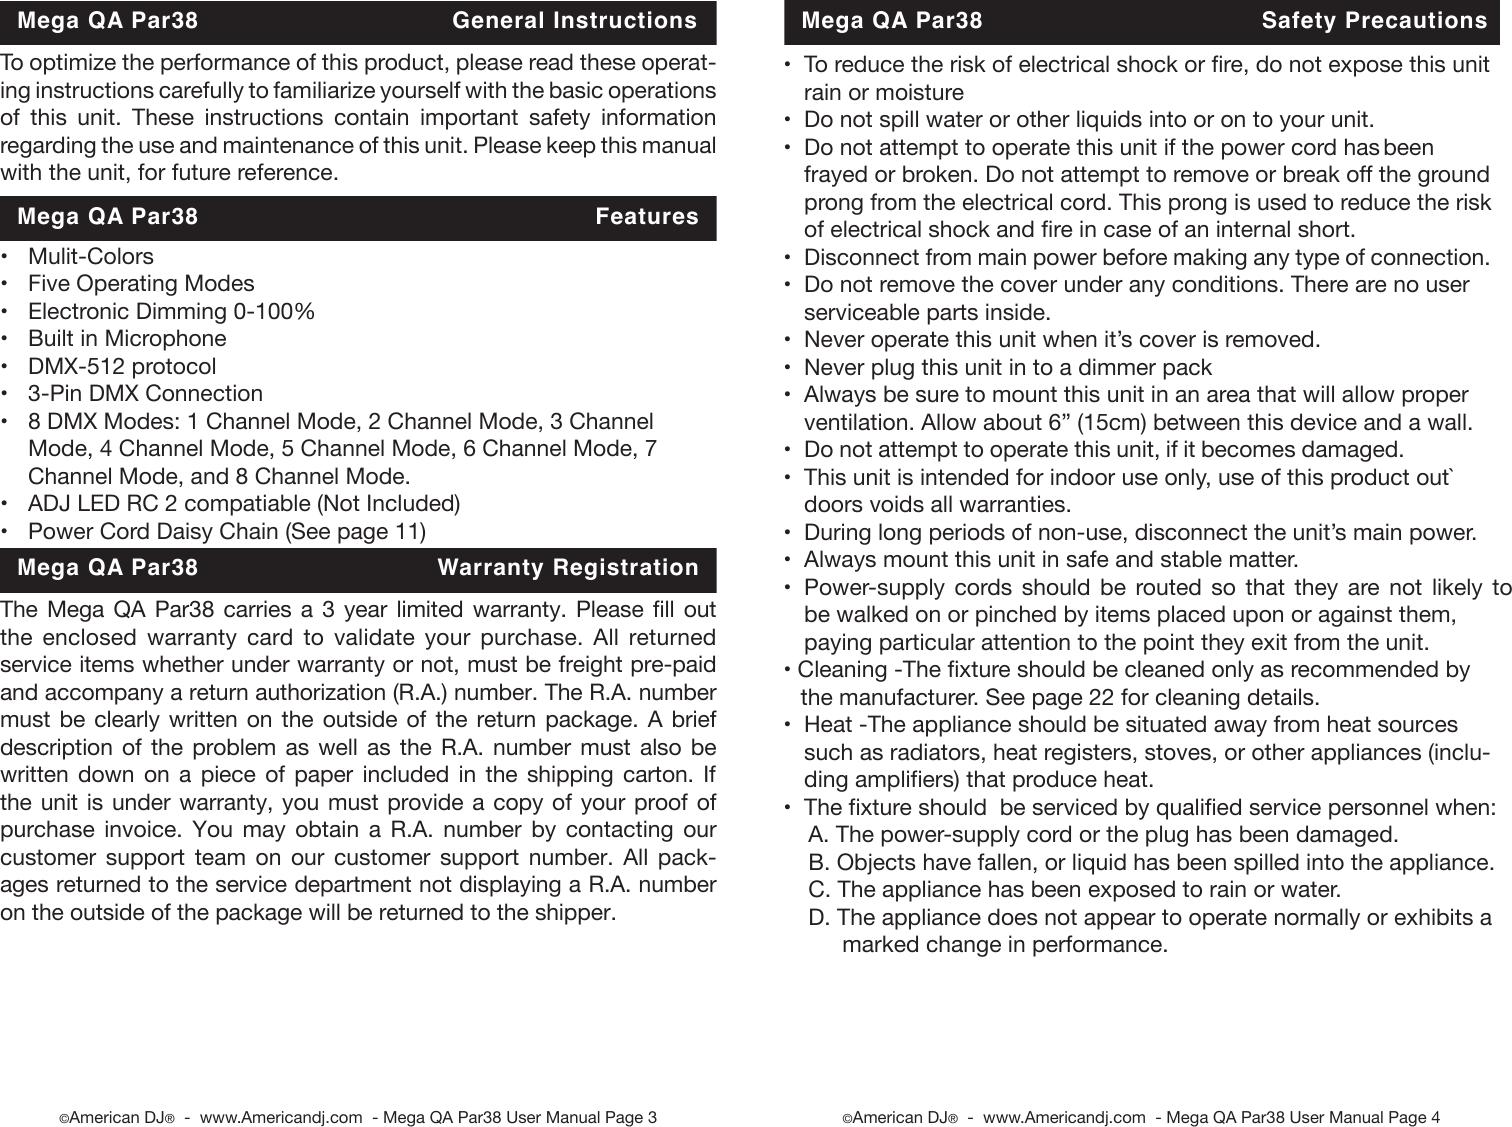 Mega Qa Par38 Cdb User Manual Dmx Daisy Chain Wiring Diagram Page 2 Of 12